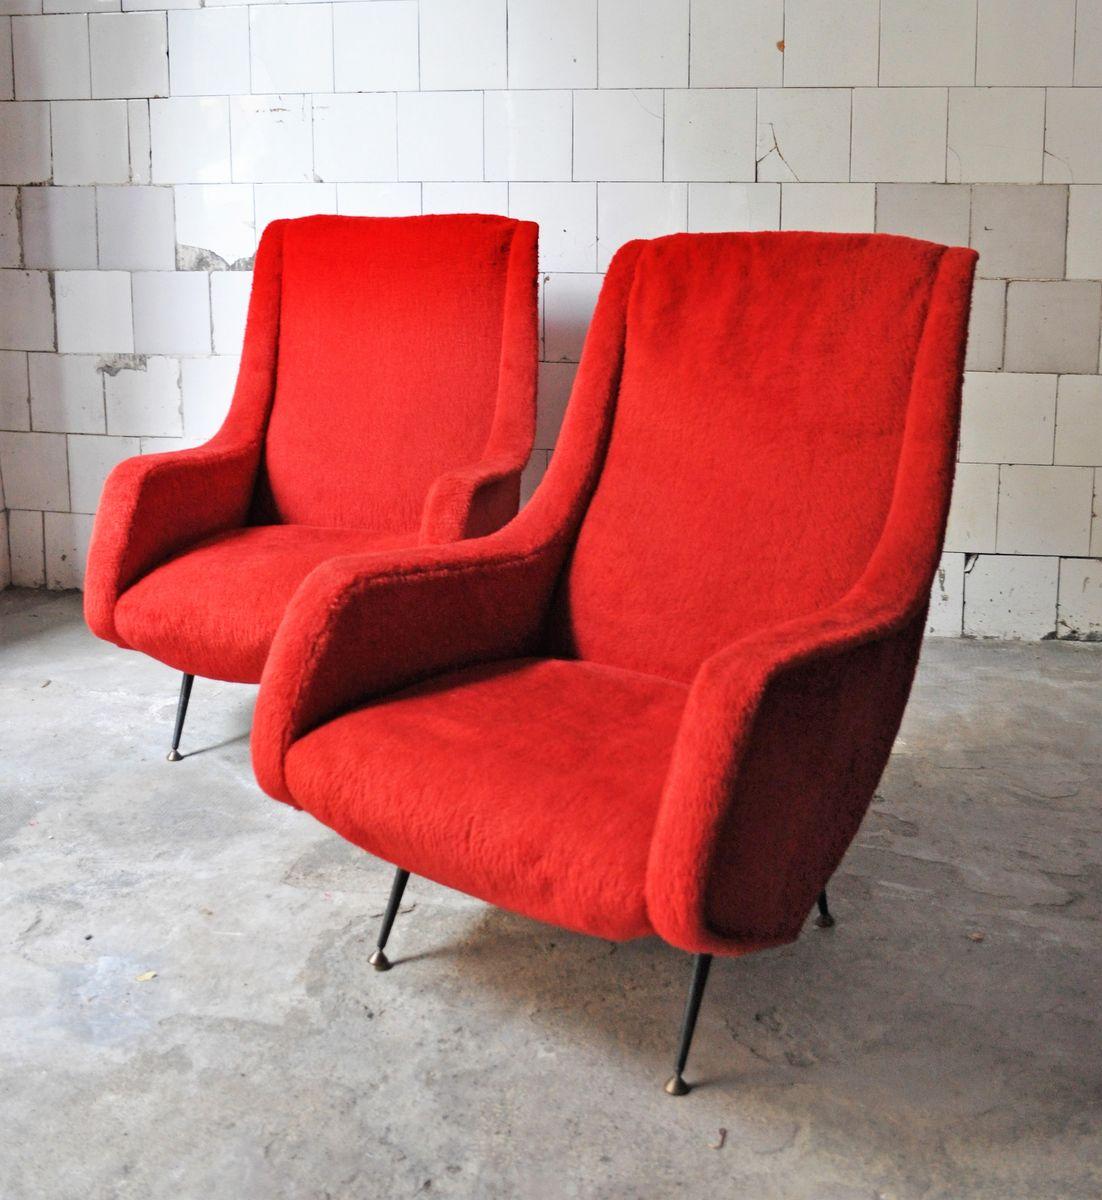 mid century sessel mit holzgestellen 2er set bei pamono. Black Bedroom Furniture Sets. Home Design Ideas